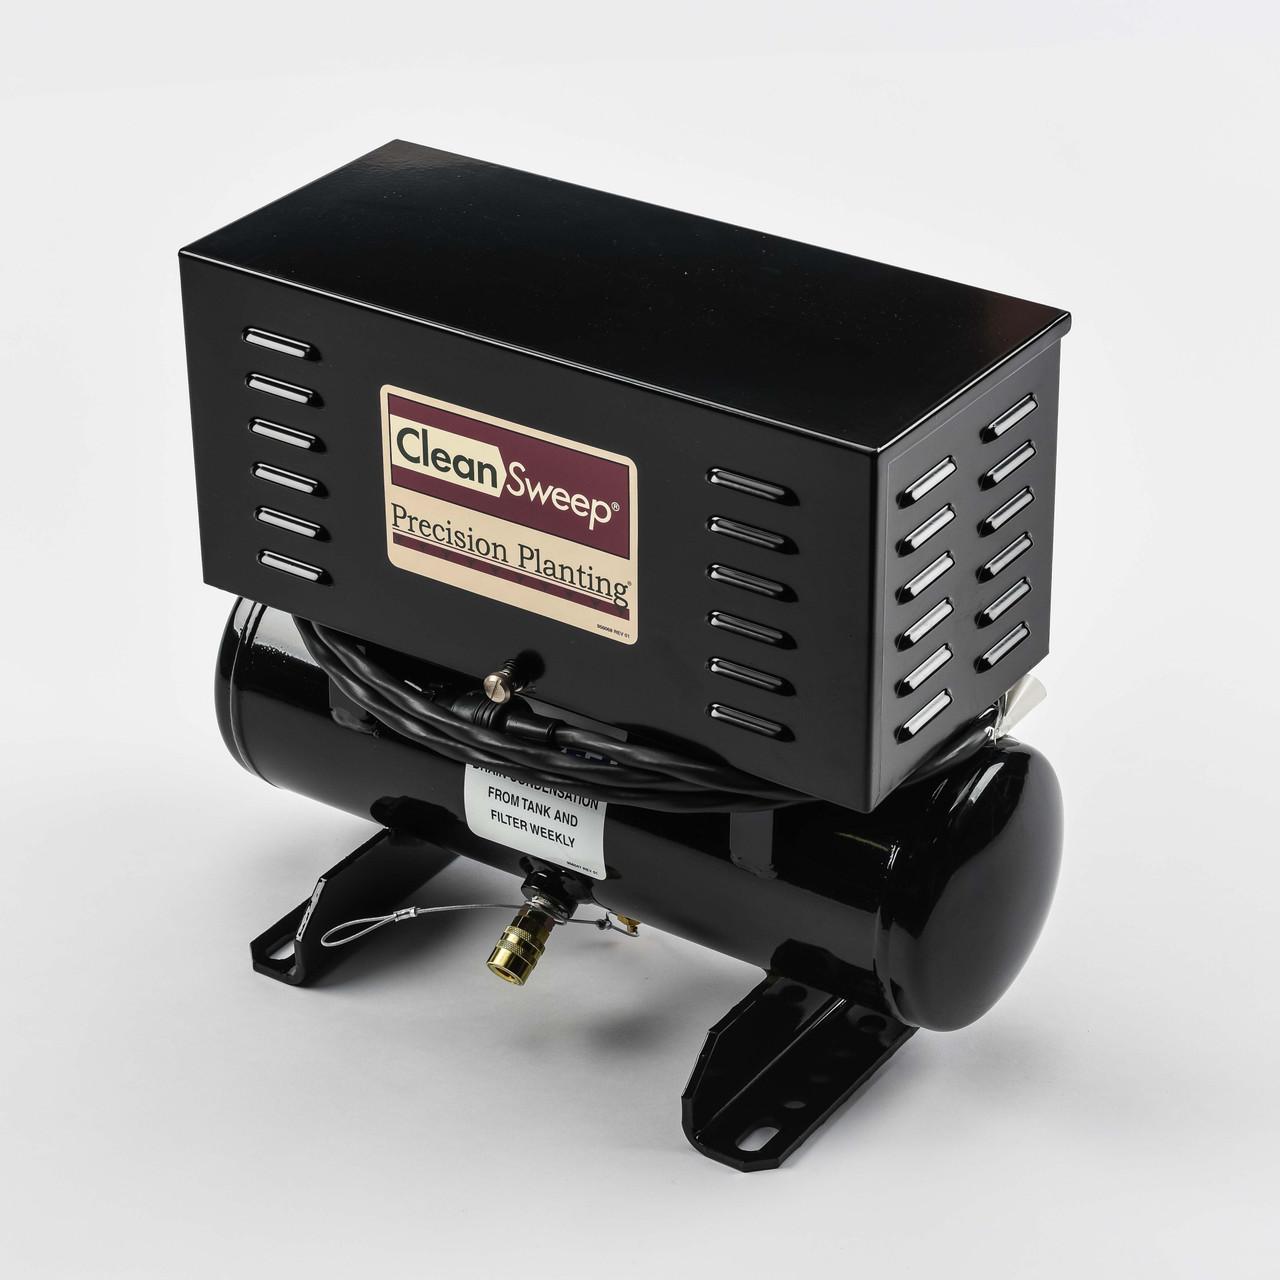 P755090 (Clean Sweep Compressor Kit)